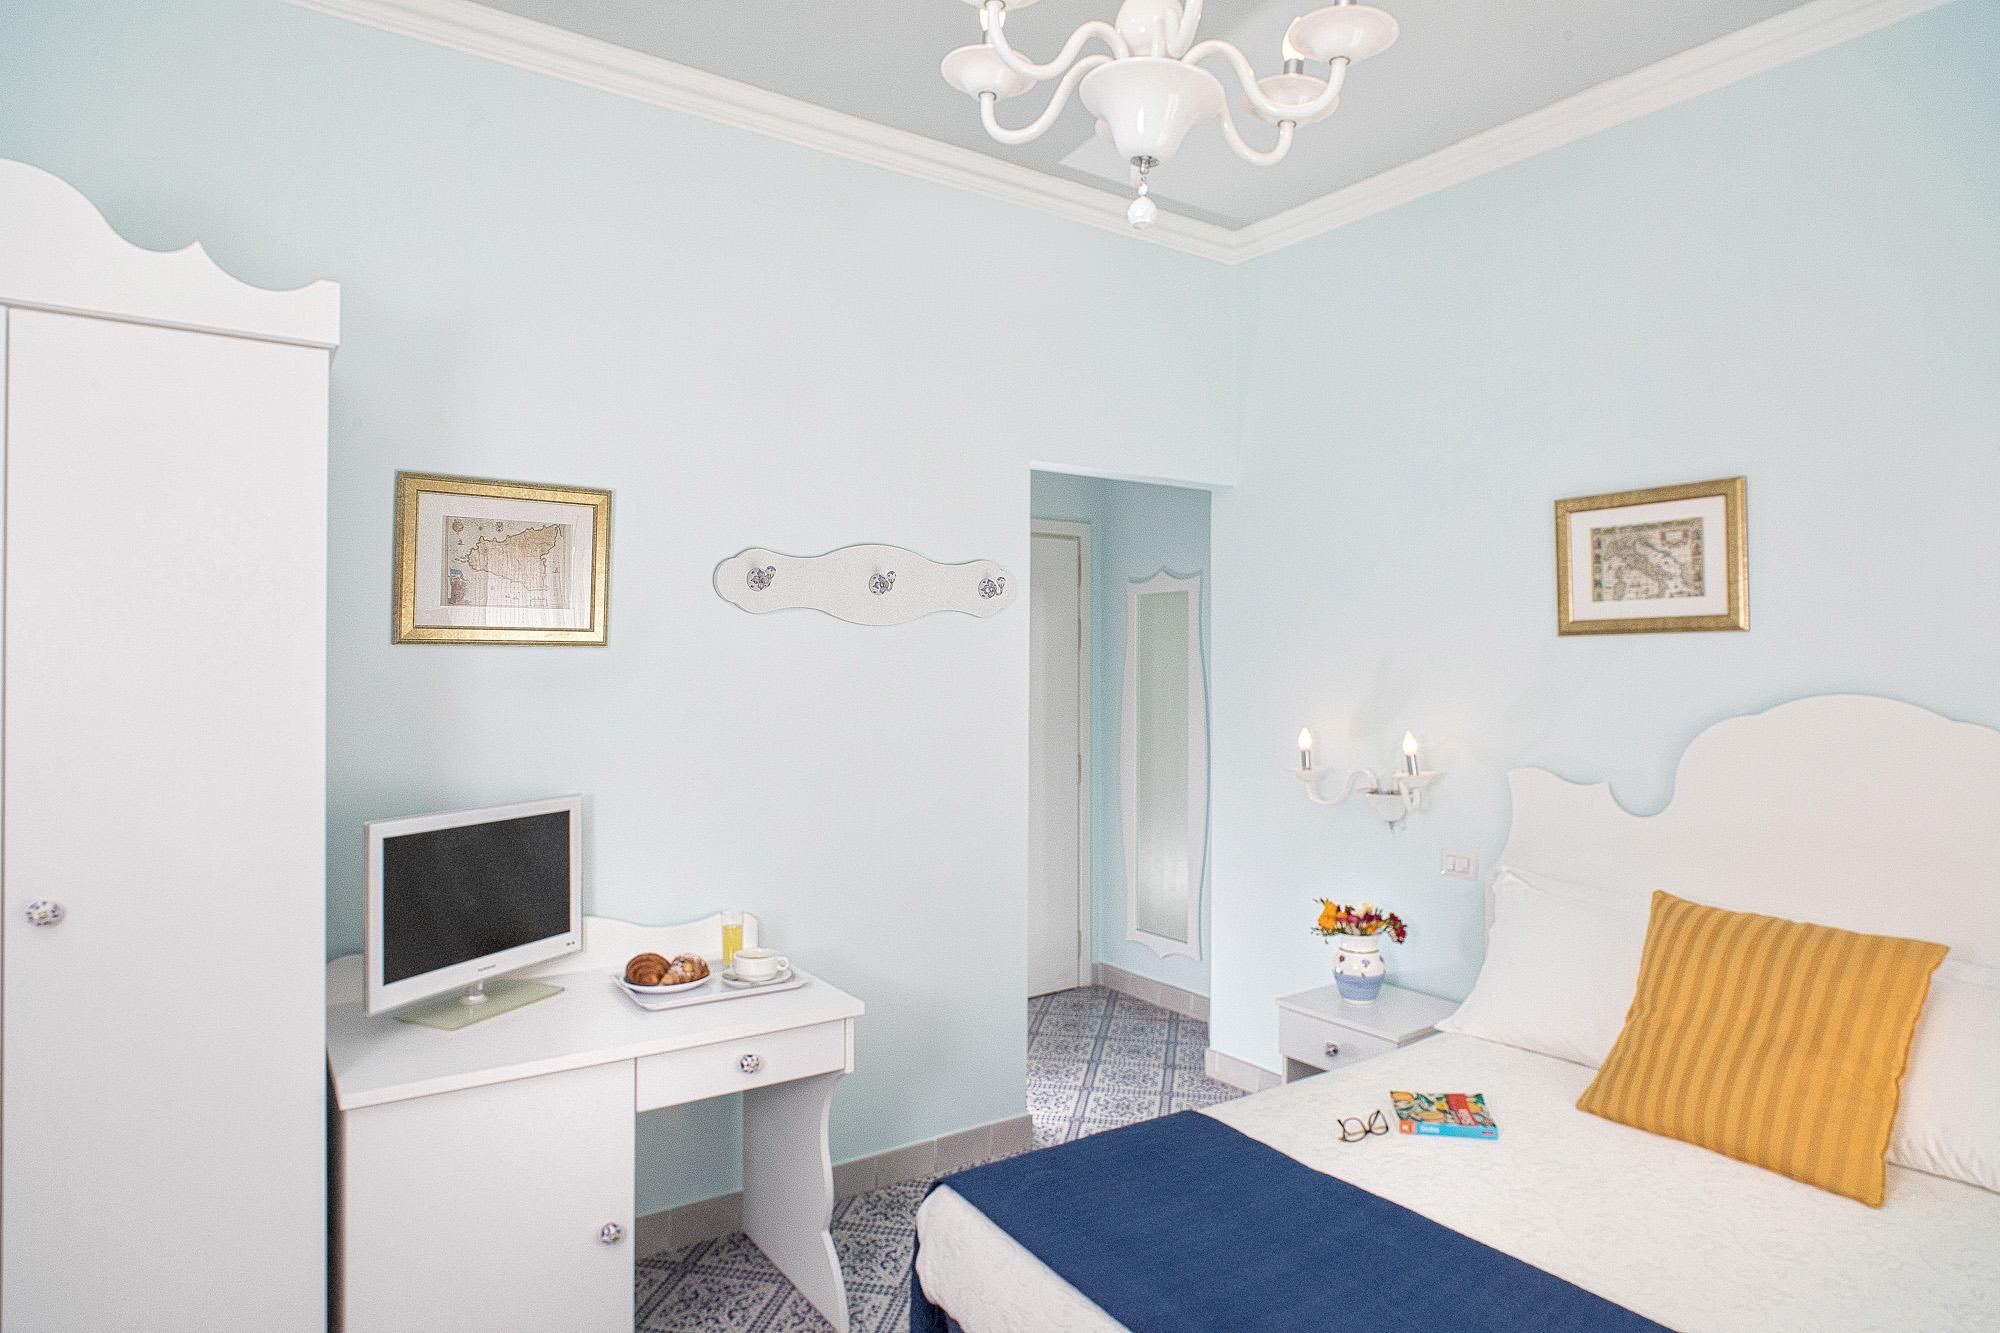 Giardini naxos hotel villa nefele 3 stelle alberghi vicino mare giardini naxos - Hotel giardini naxos 3 stelle ...